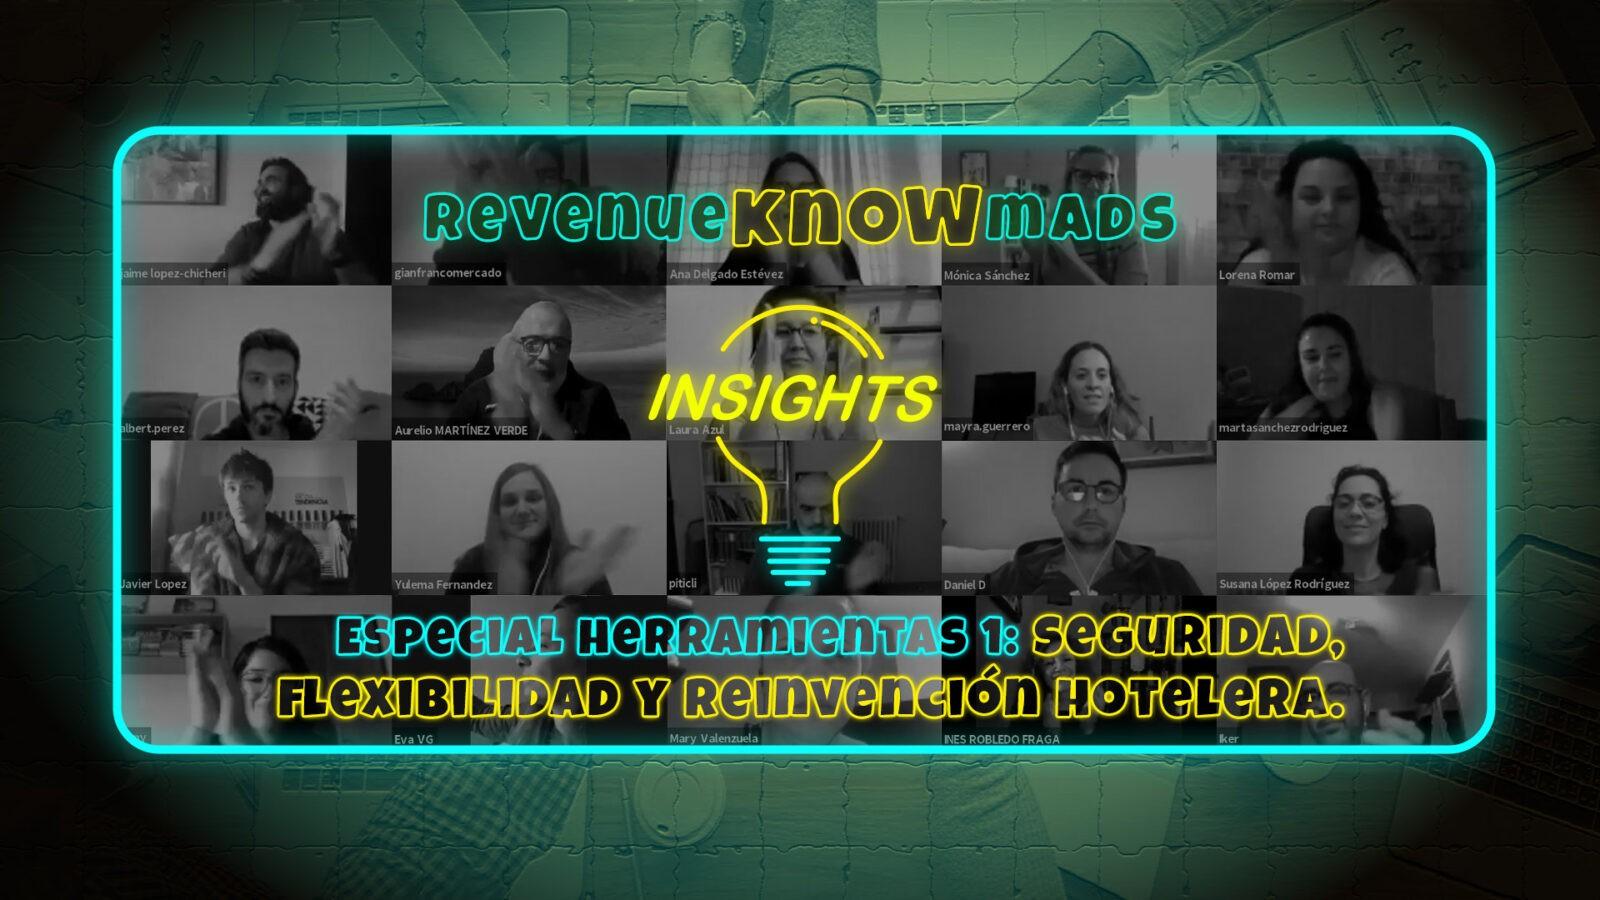 RevenueKnowmads Insights - Especial Herramientas 1